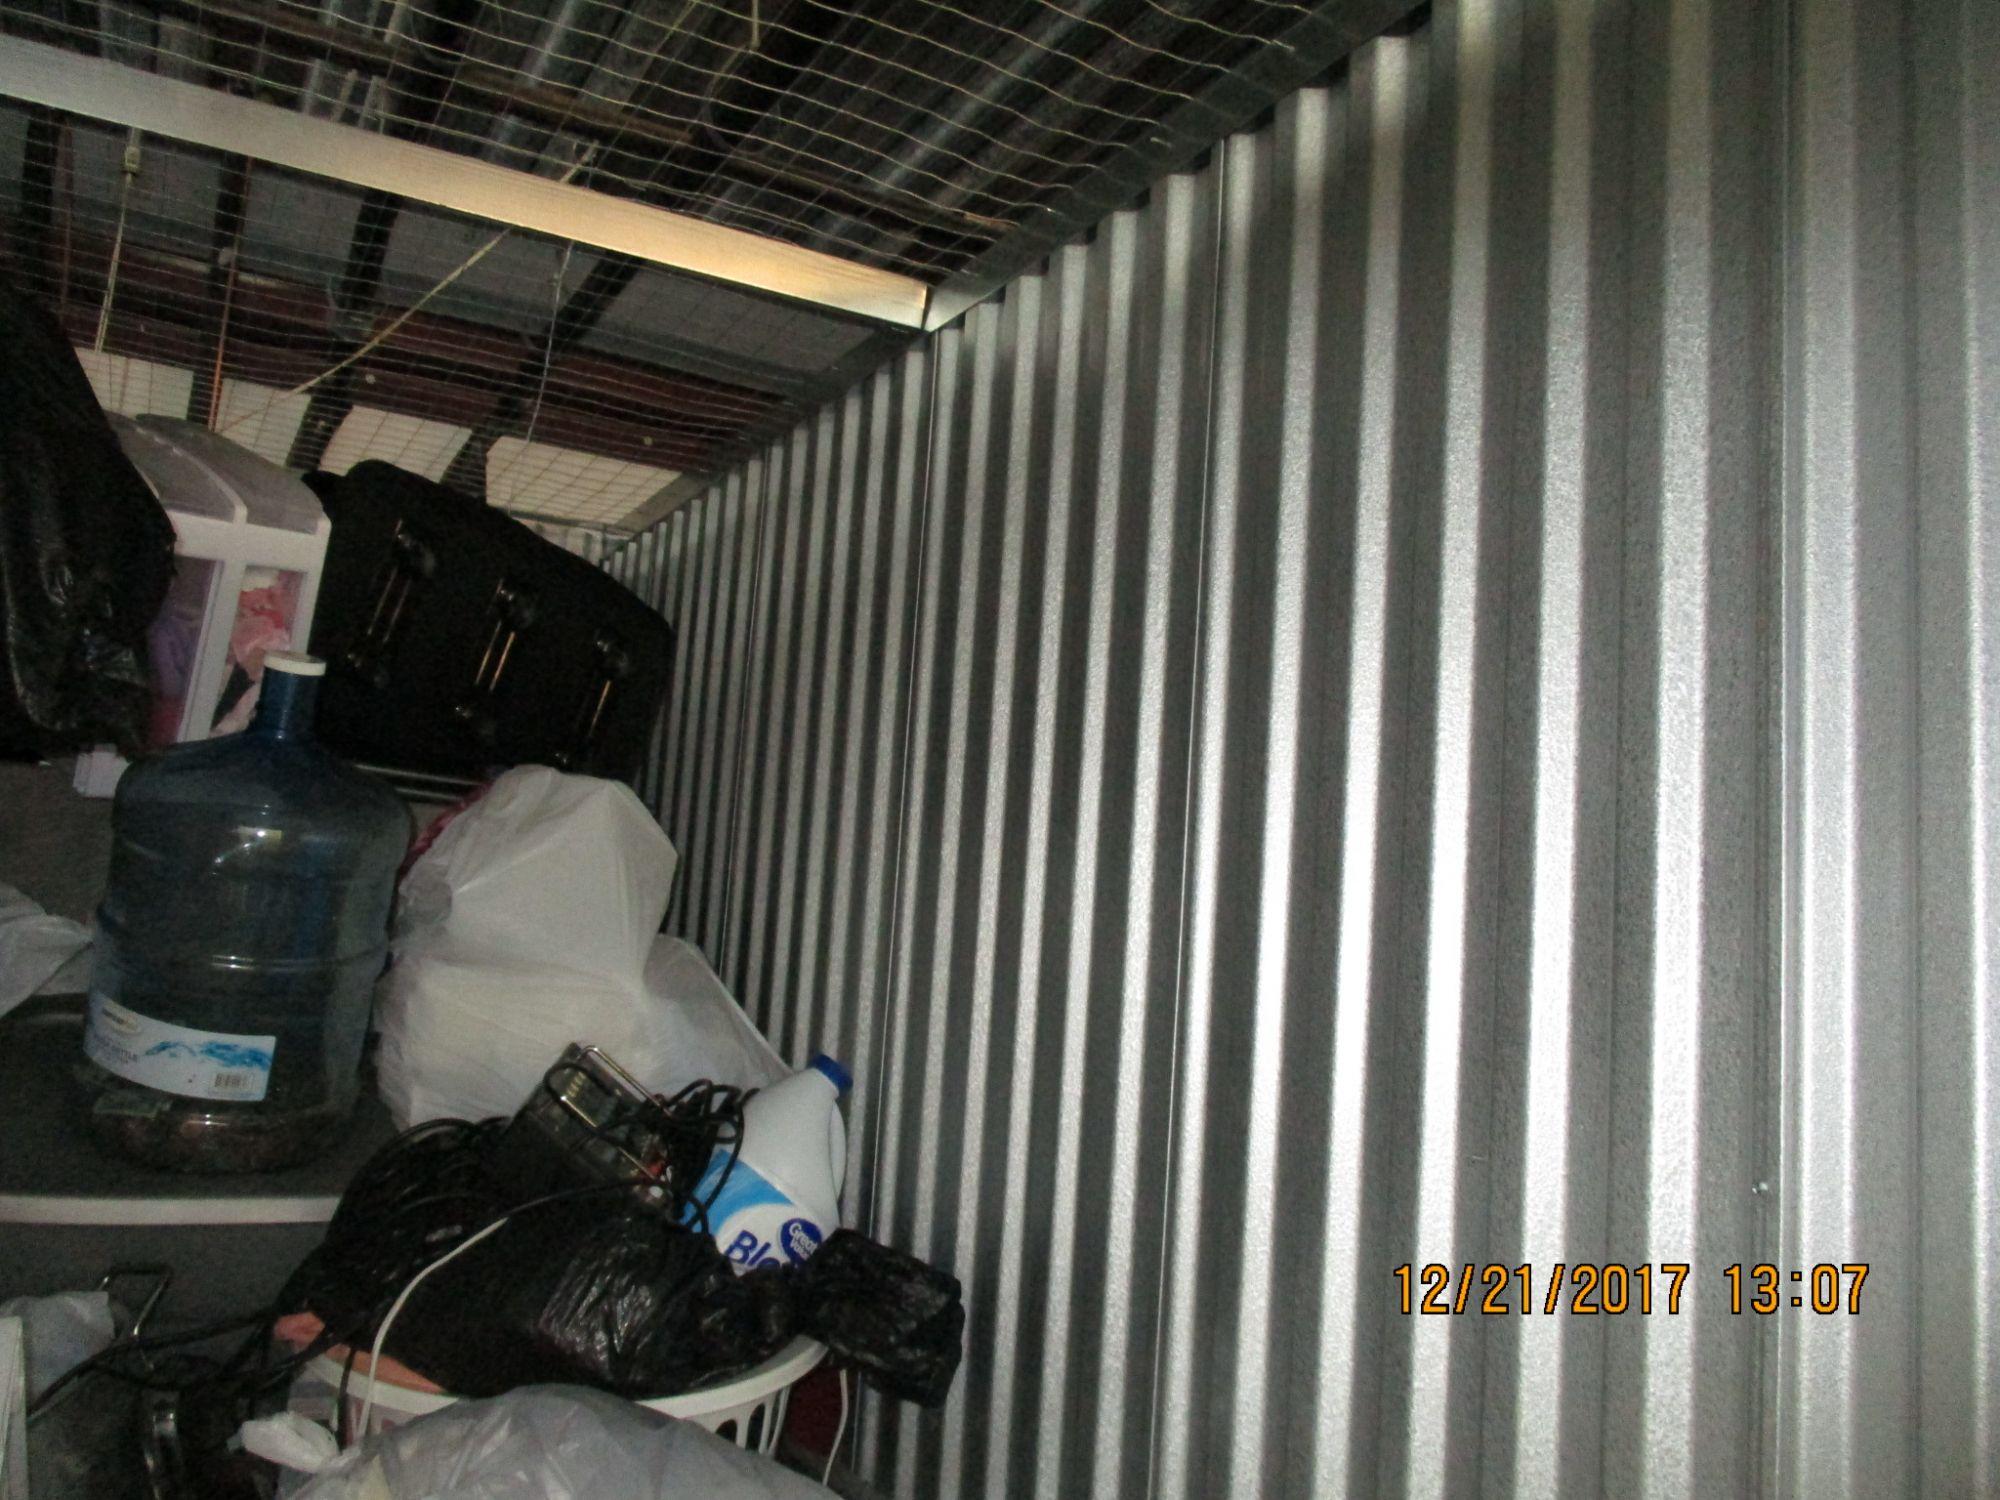 Storage Unit Auction 527087 Miami Gardens Fl & Storage Unit Auctions Florida - Listitdallas